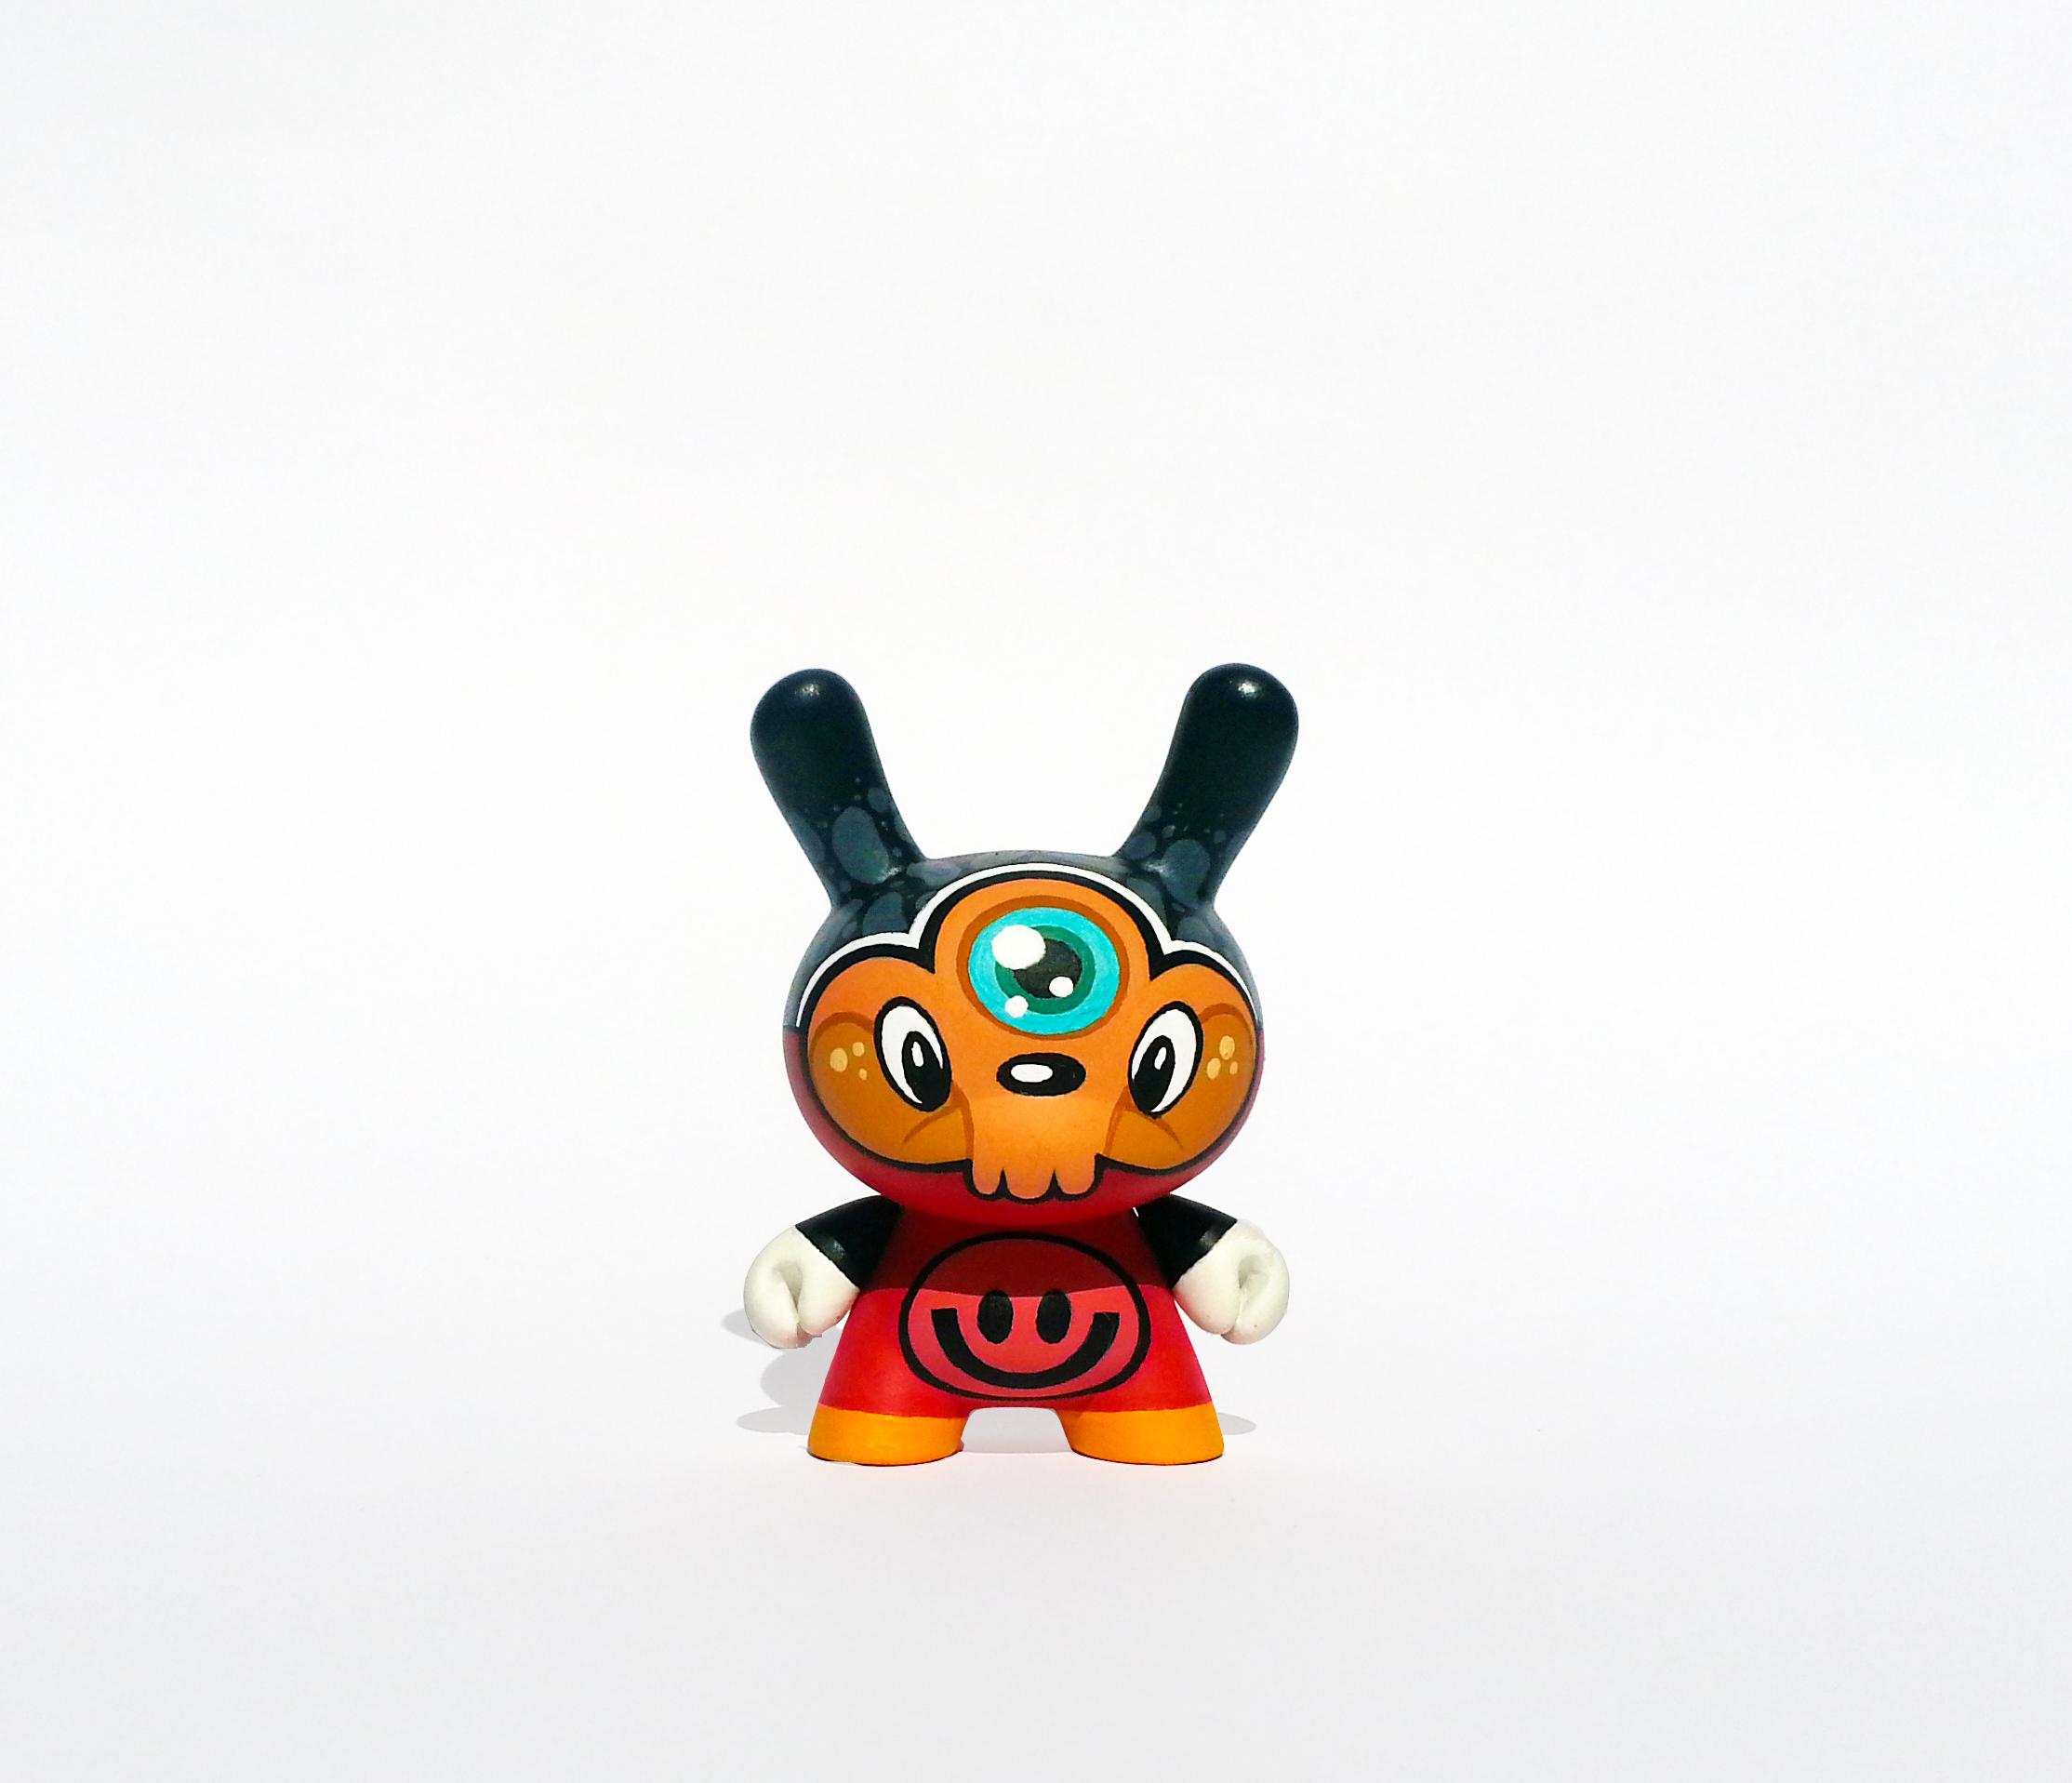 EyeSkull Series - WuzOne 5